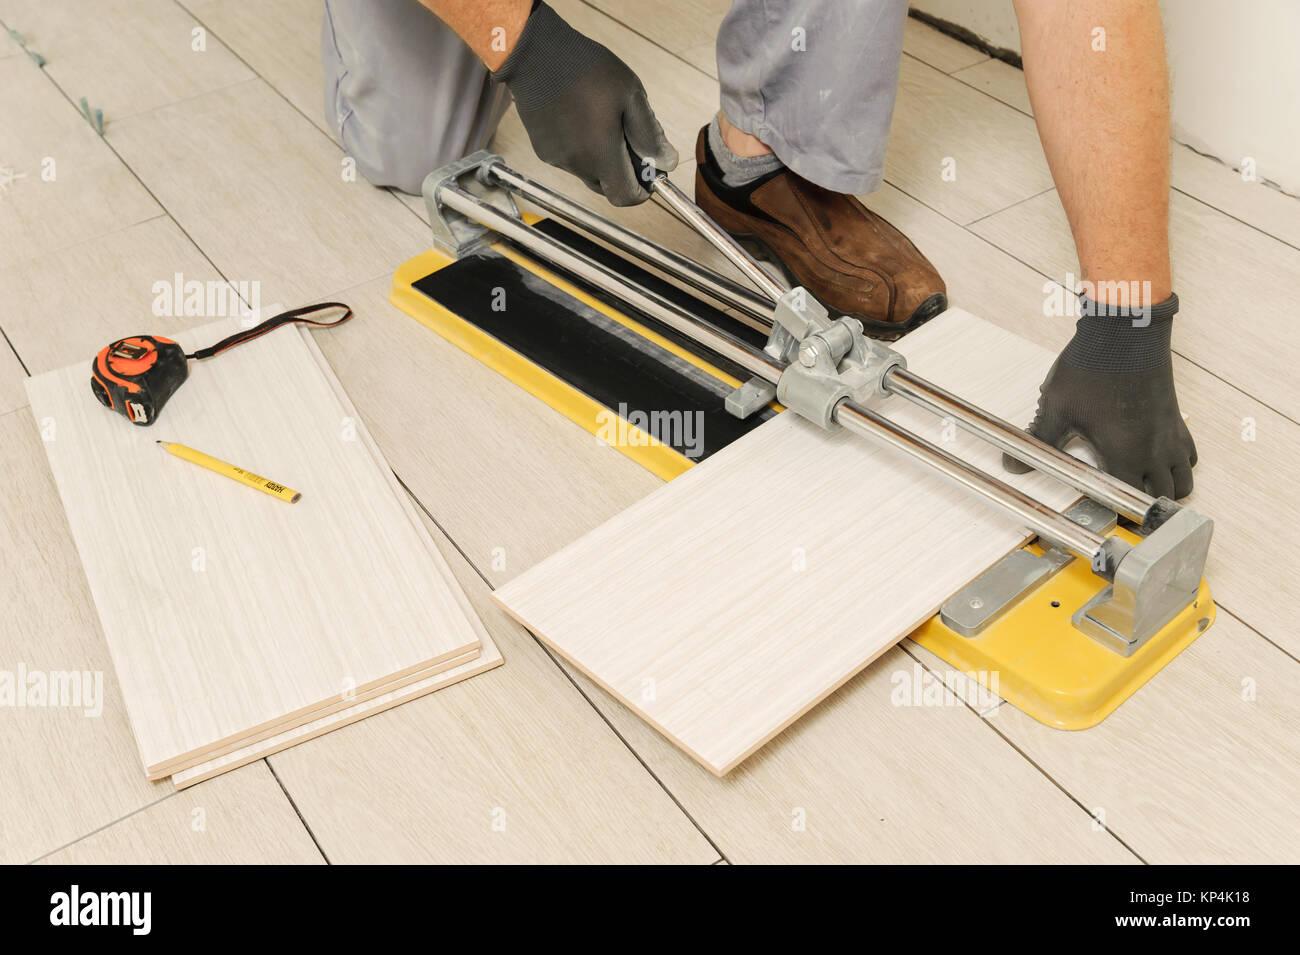 Laying Ceramic Tiles Tiler Cuts Tile Manual Cutter Stock Photo